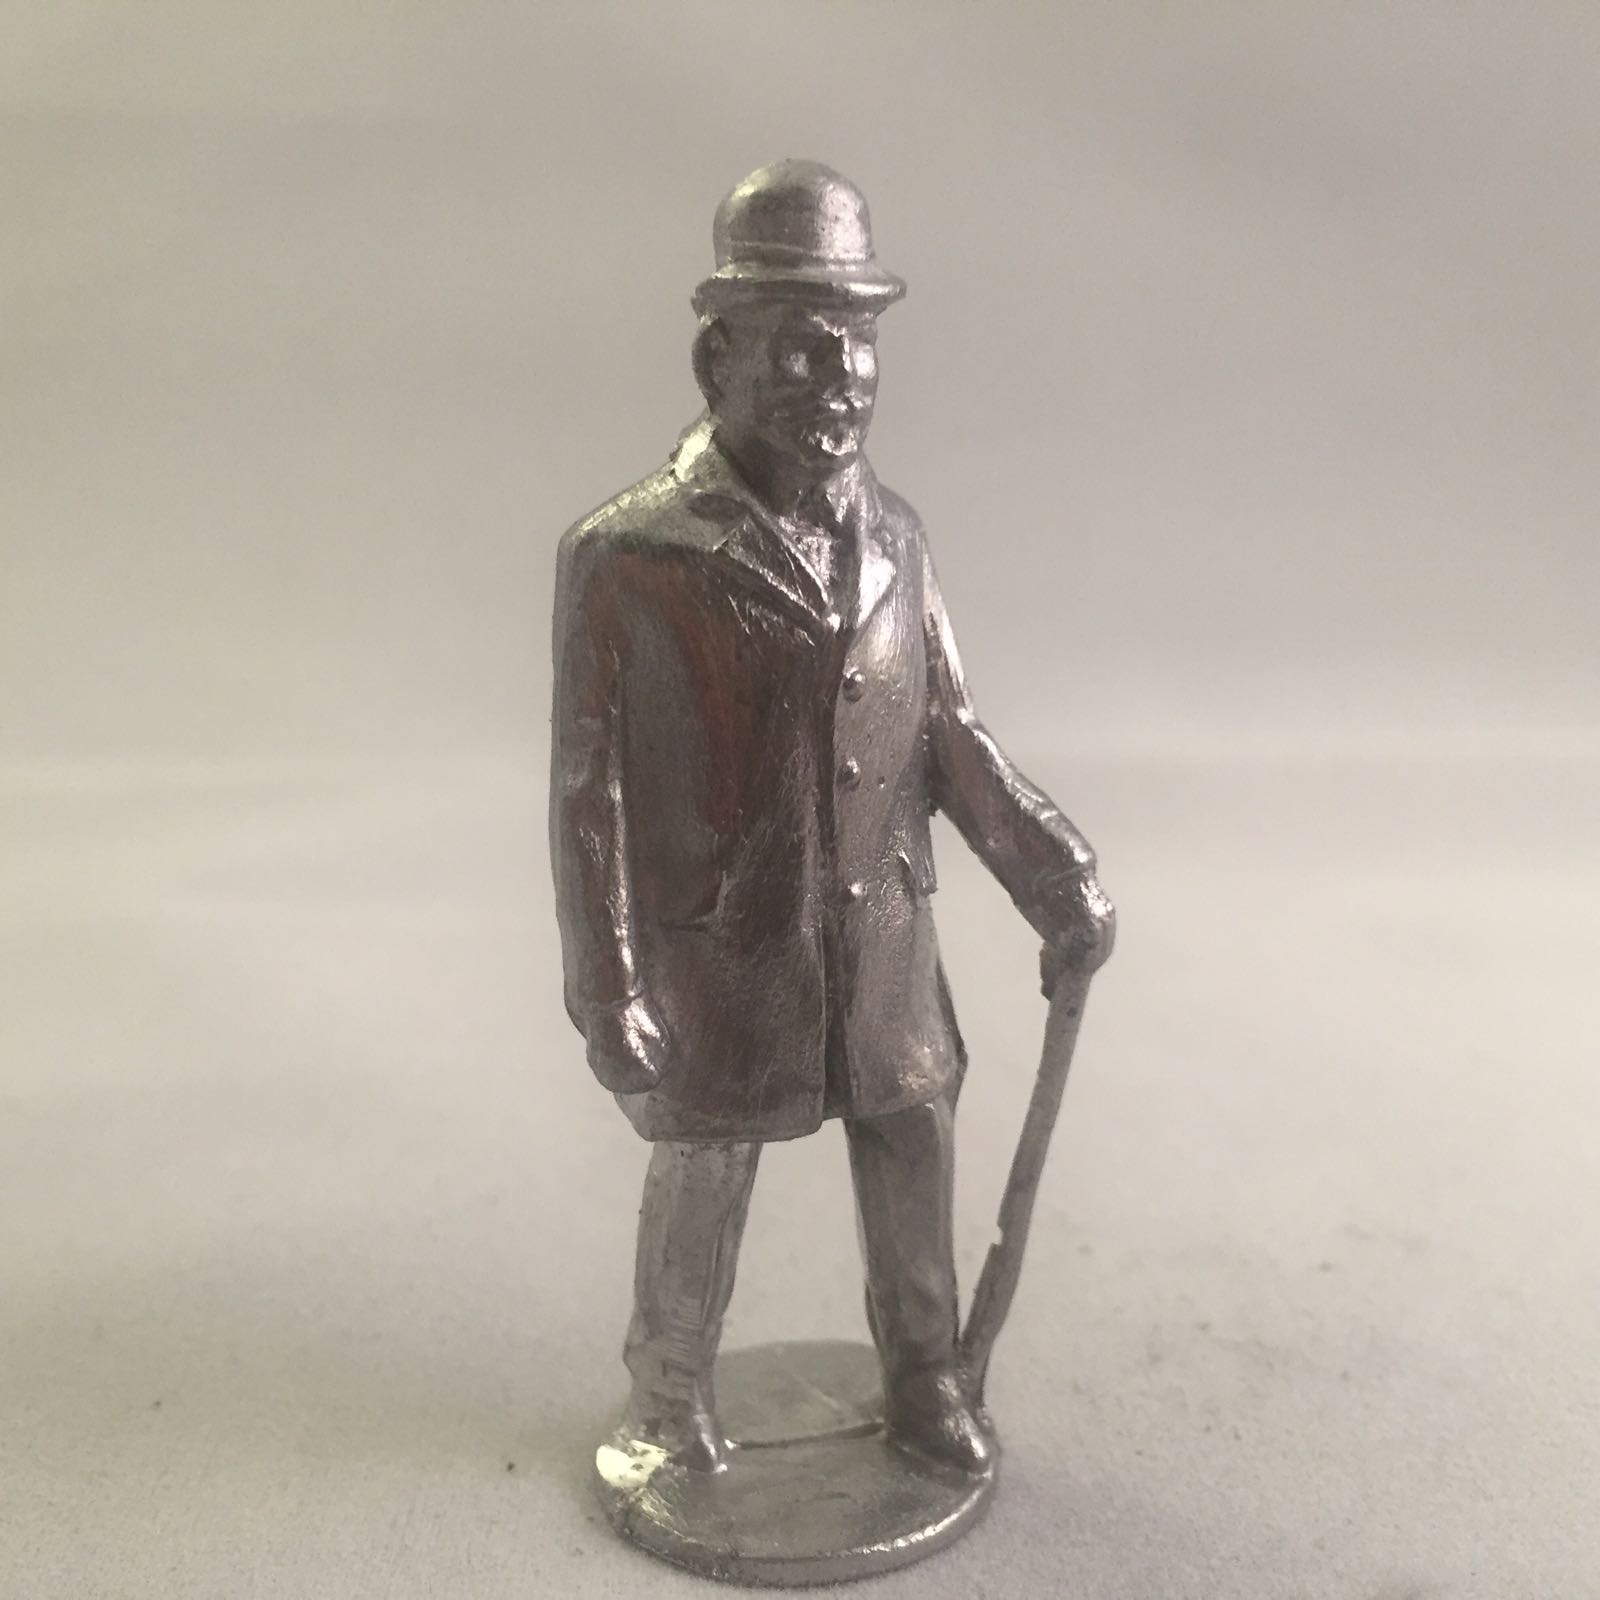 B57. Old Man walking with cane.